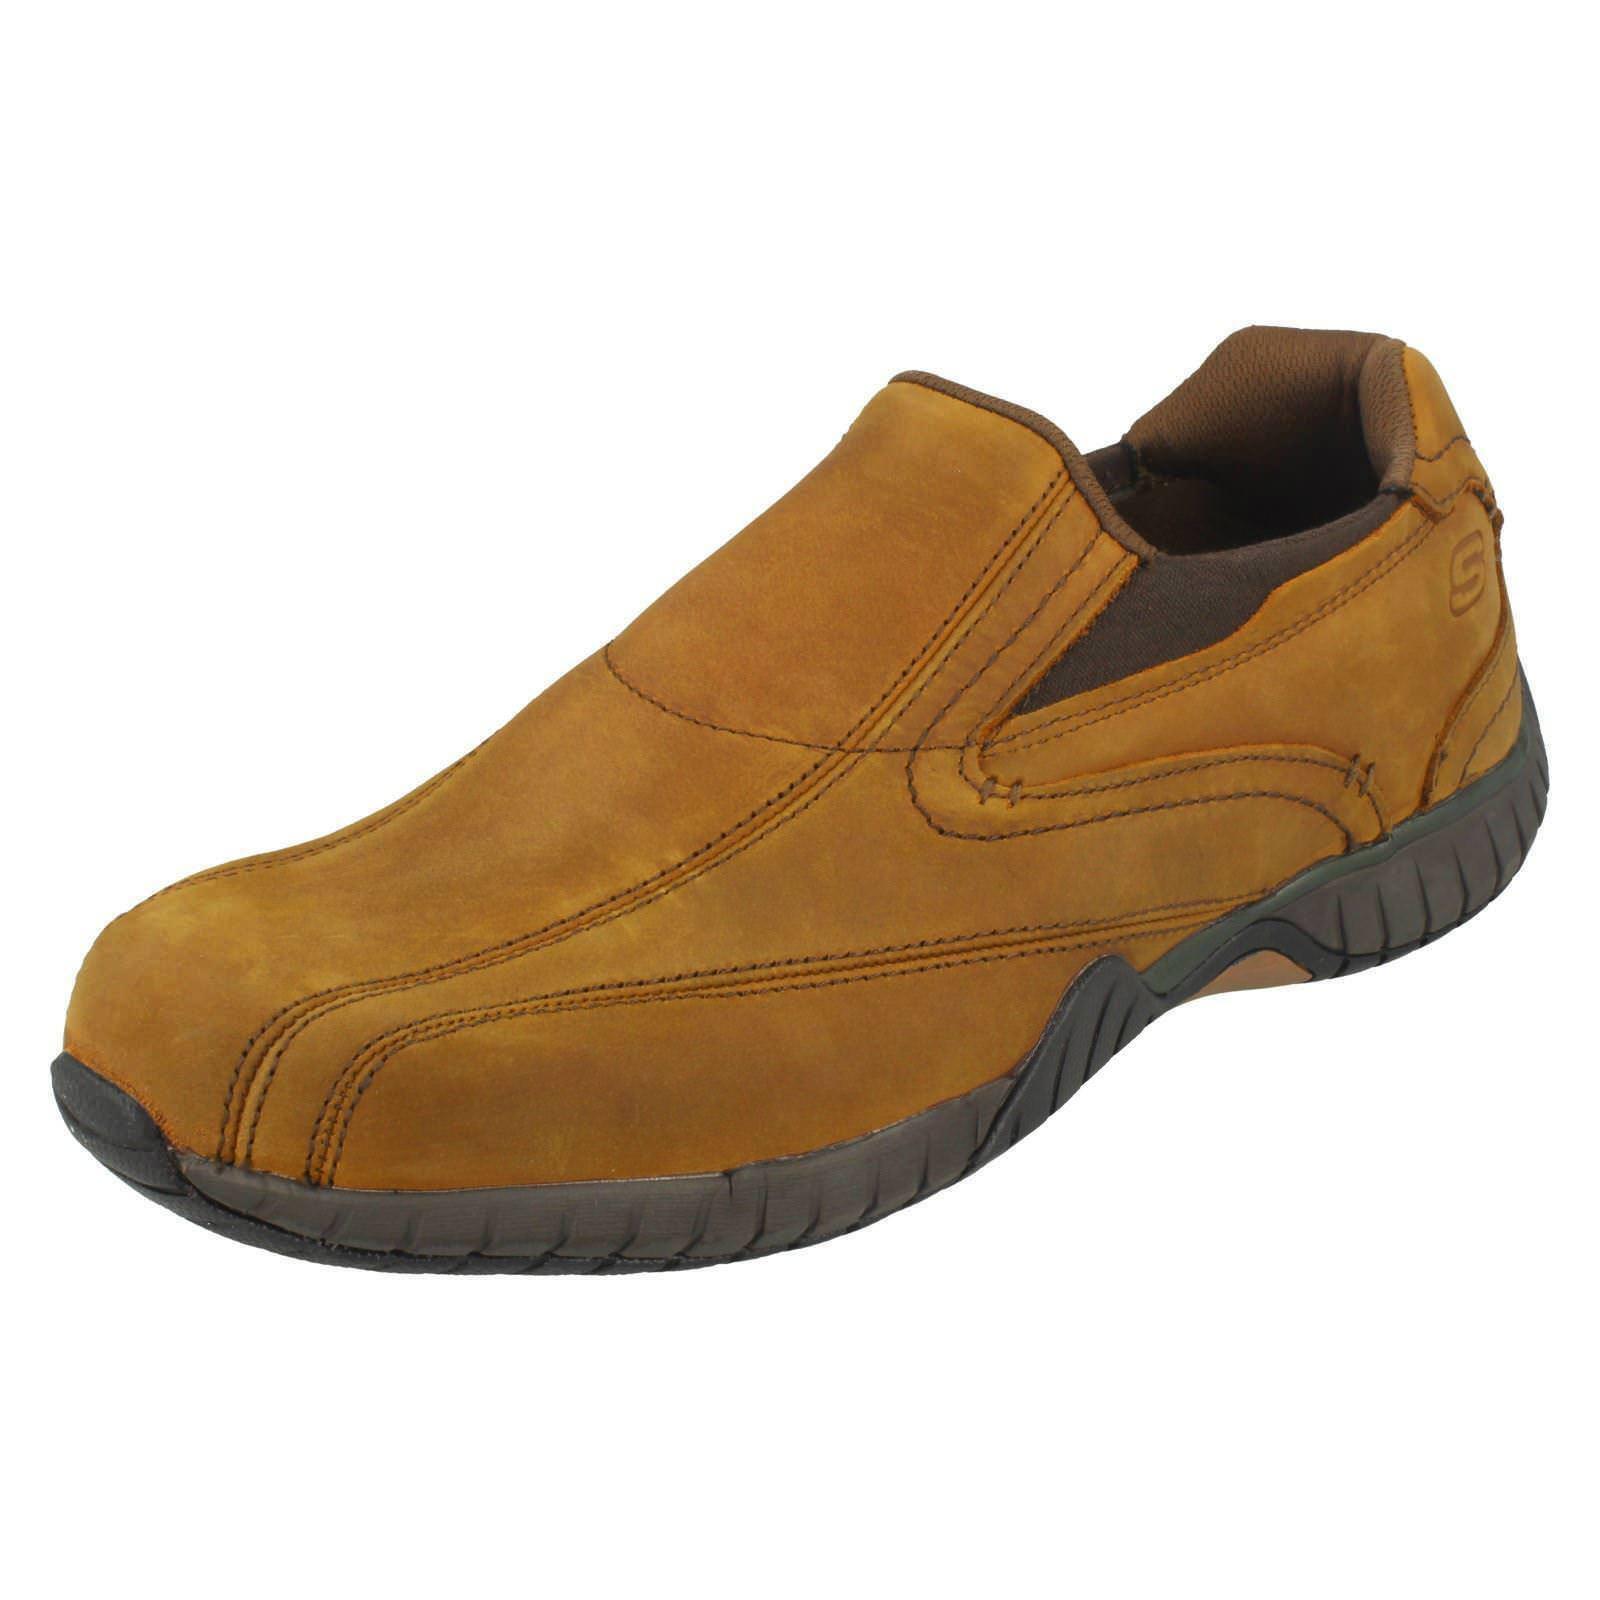 Da Uomo Marrone Slip On pelle Nubuck Skechers Scarpe Casual Ginnastica - Bascom | Design ricco  | Gentiluomo/Signora Scarpa